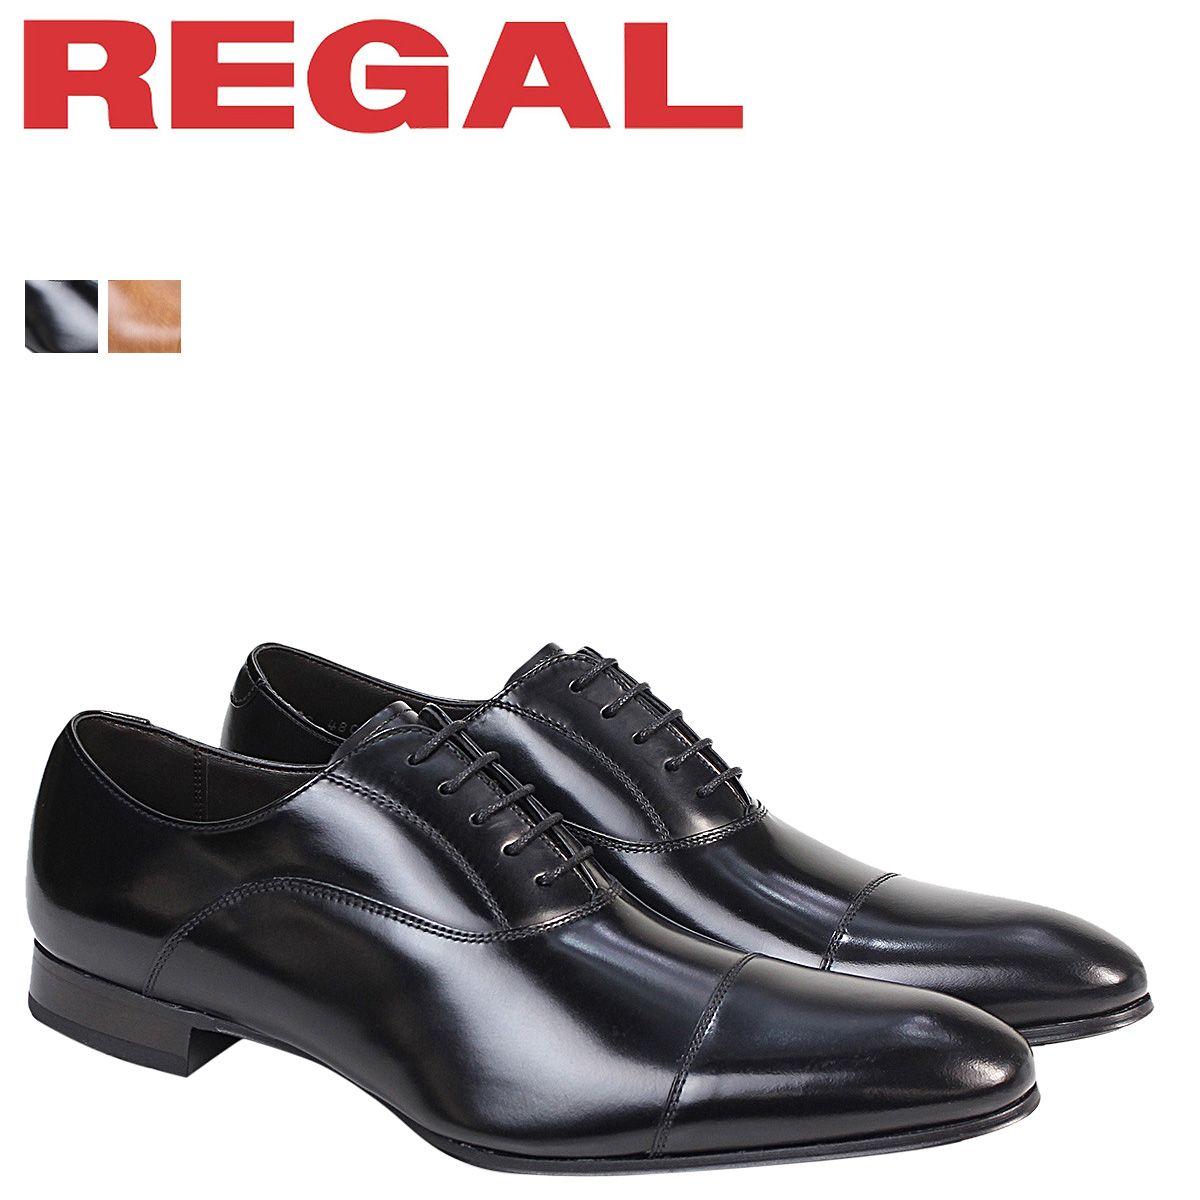 REGAL 011RAL 靴 メンズ リーガル ストレートチップ ビジネスシューズ 防水